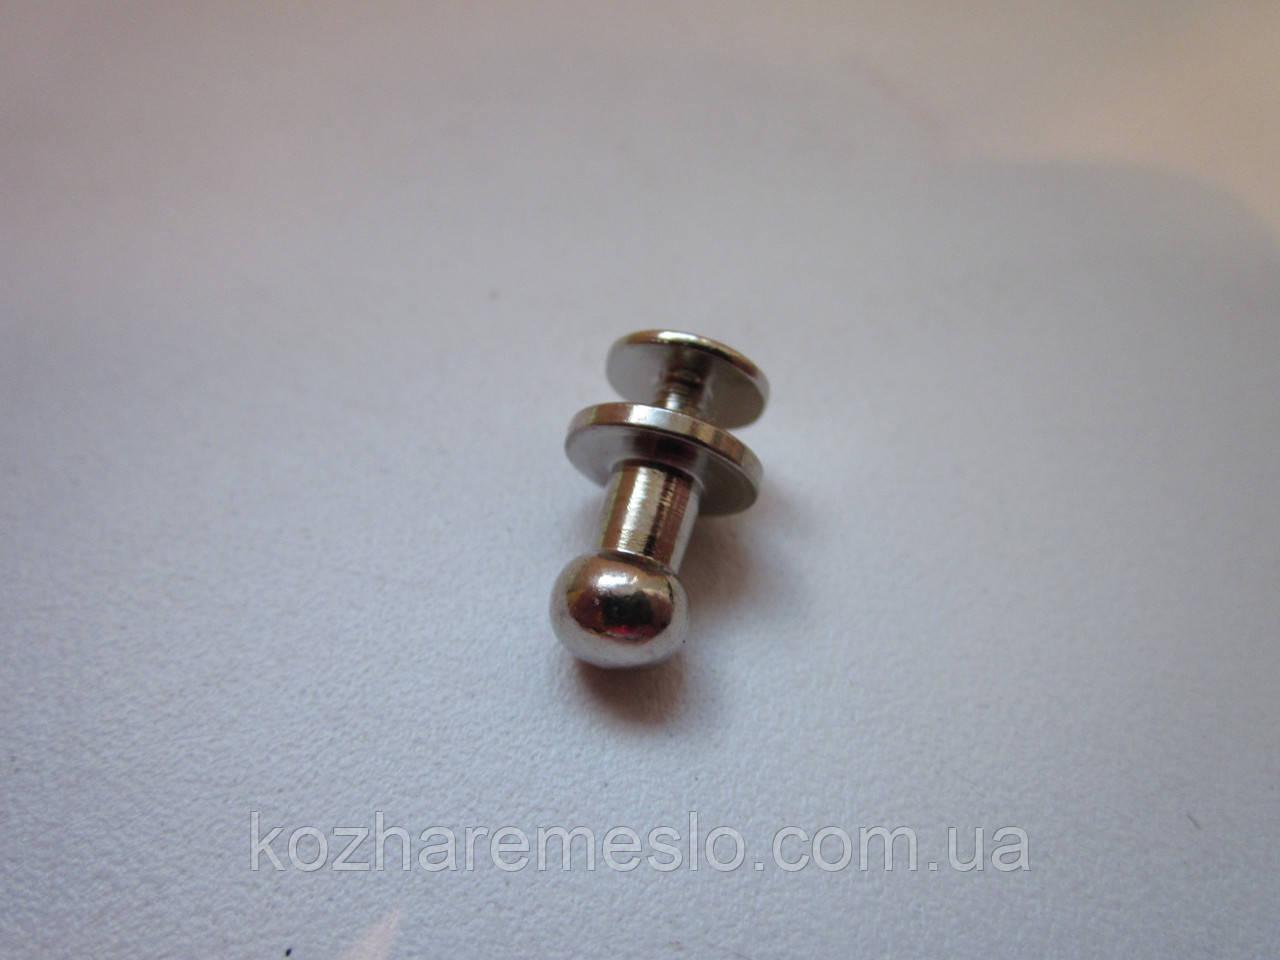 Винт кобурной 6 х 10 мм никель